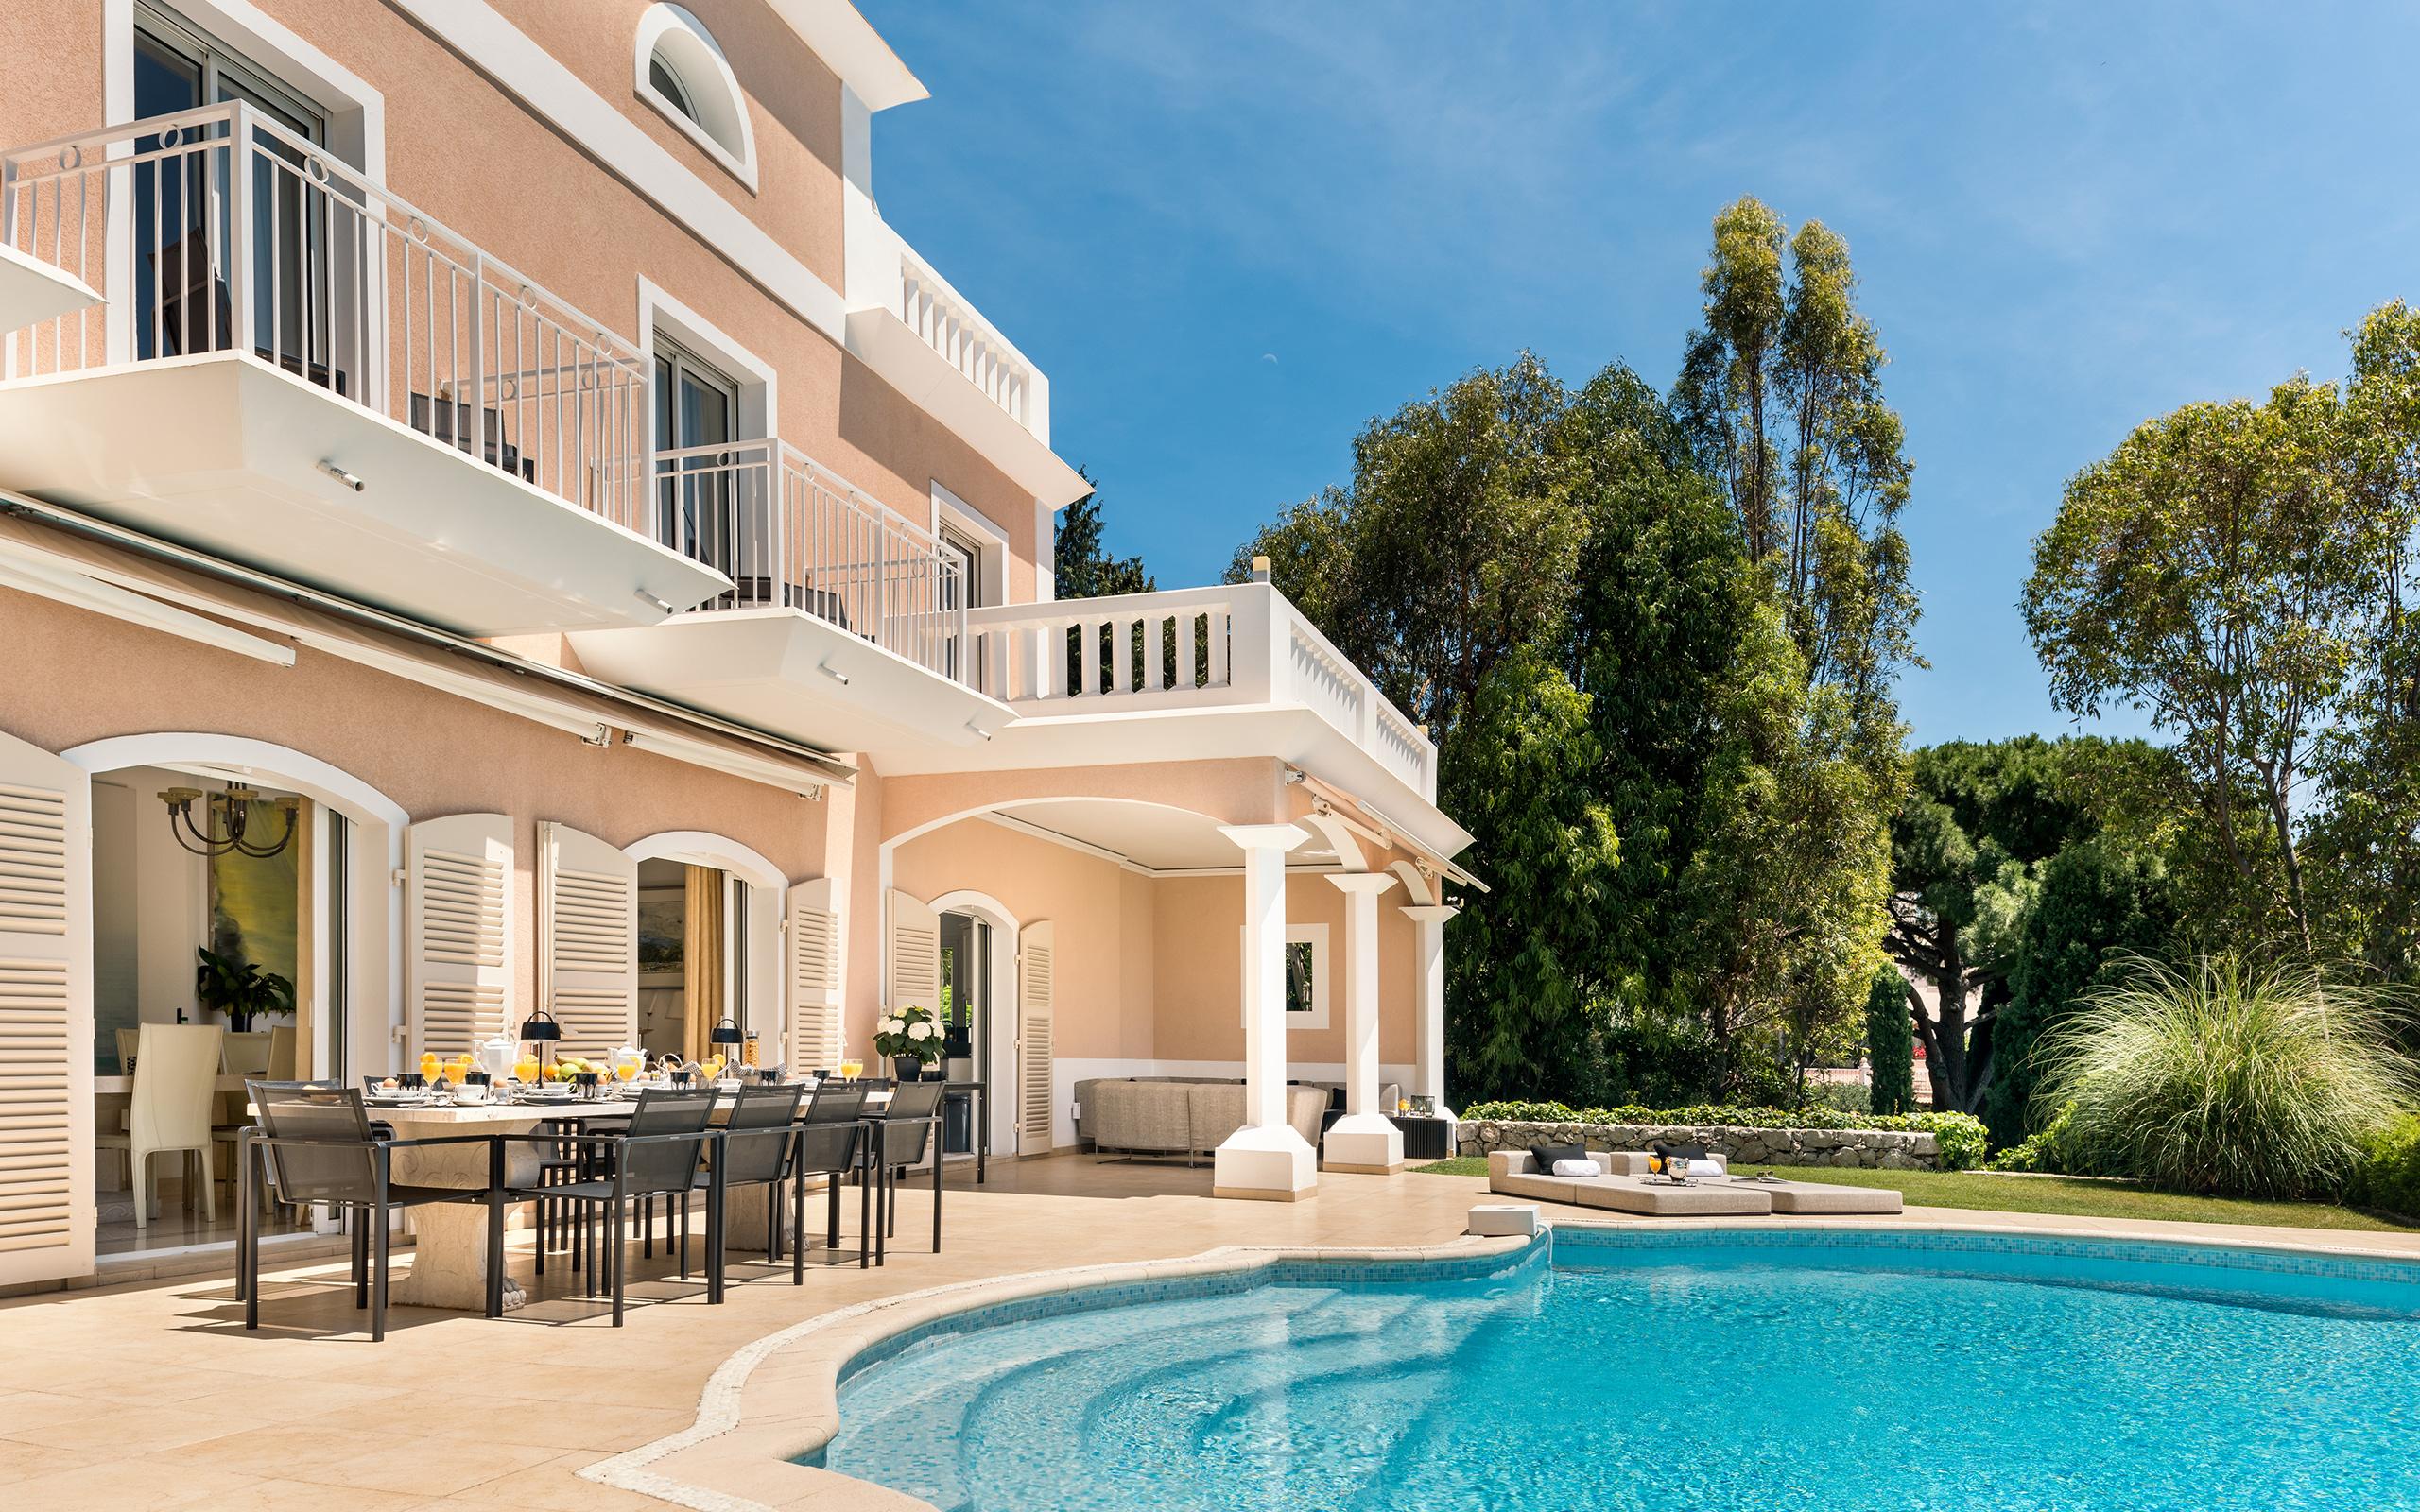 villa fleuri true luxury villas. Black Bedroom Furniture Sets. Home Design Ideas